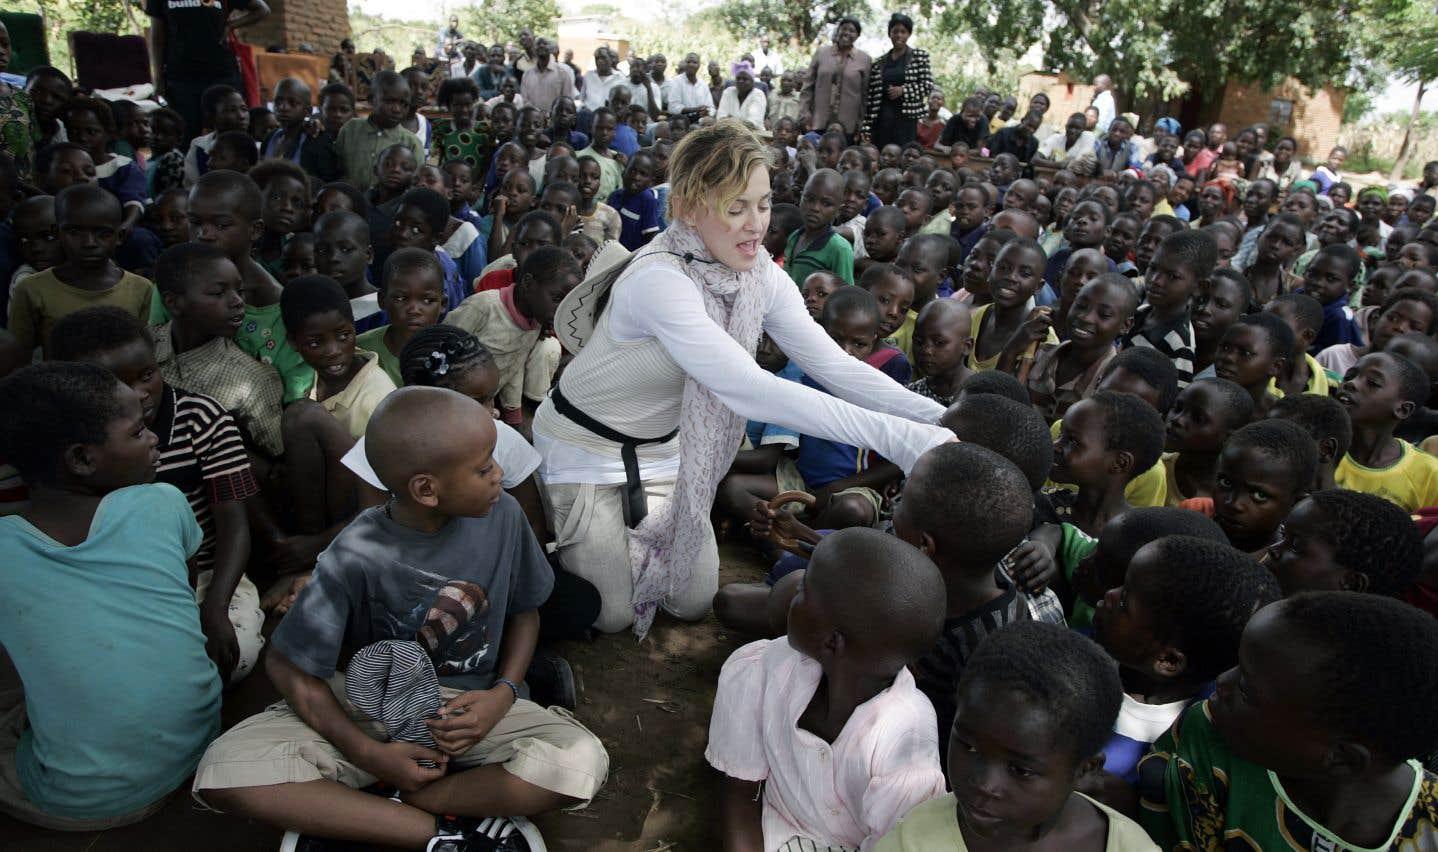 Le «volontouriste», ce mauvais samaritain